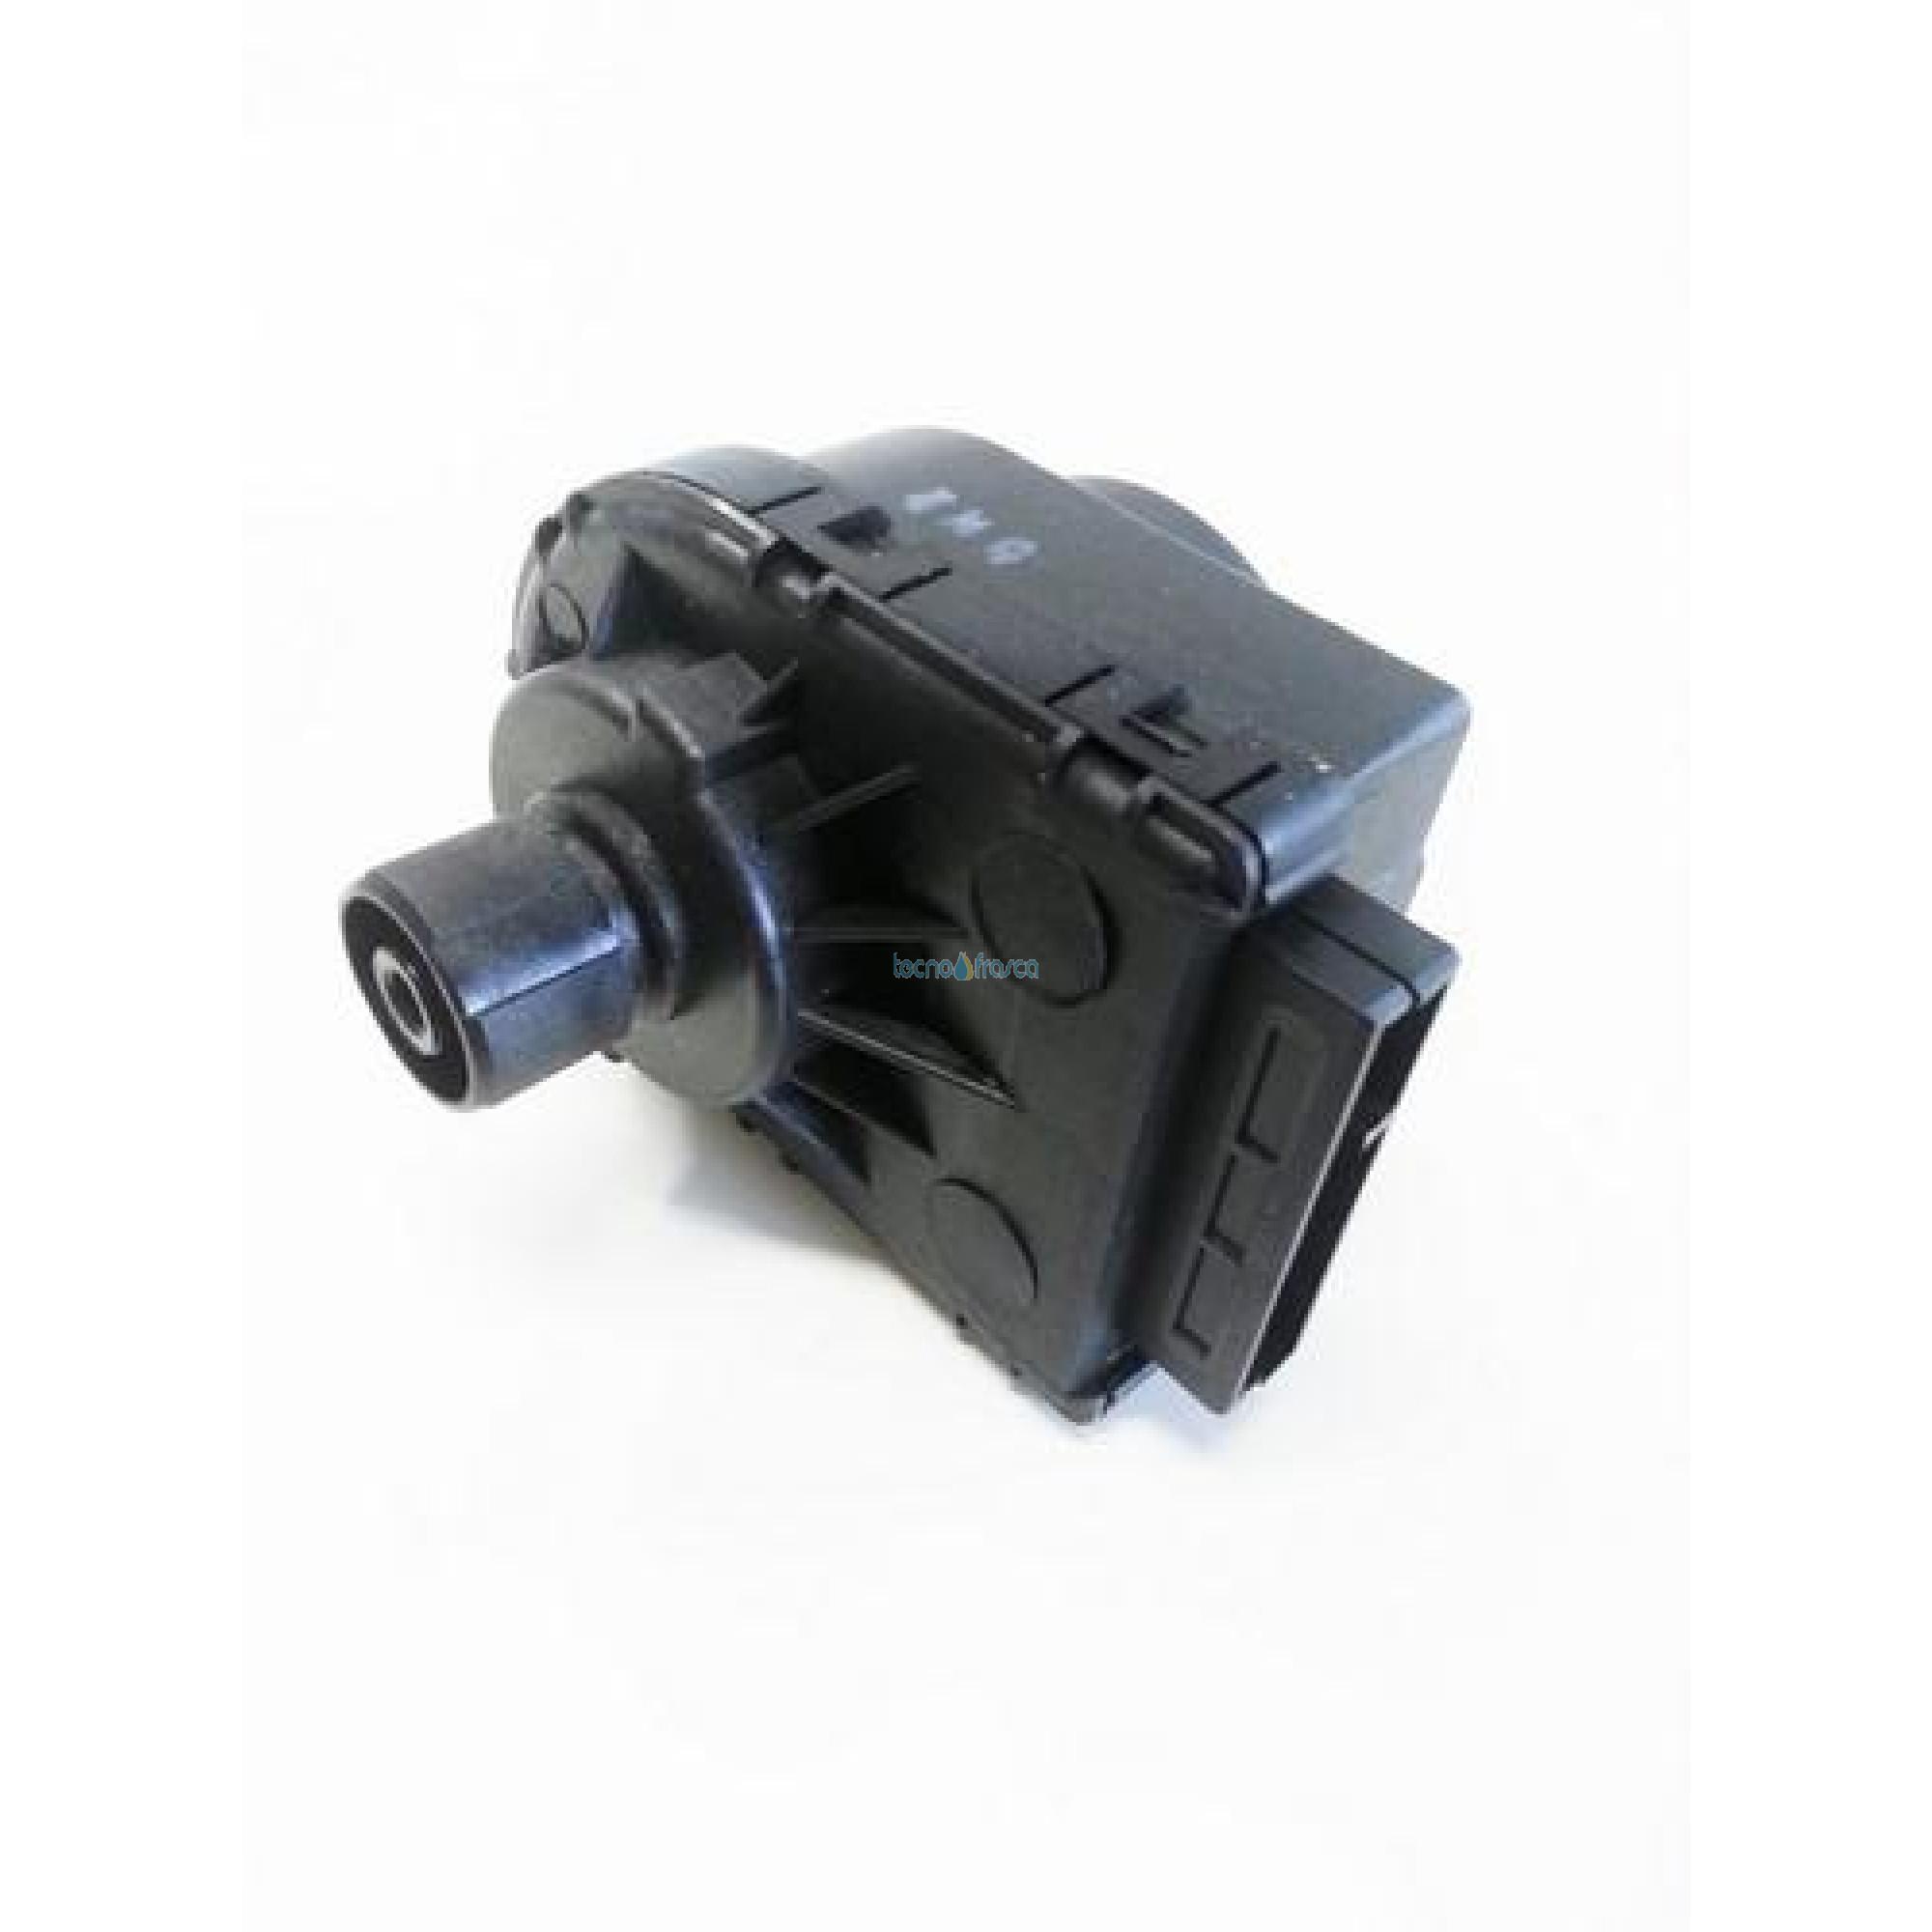 Unical motore valvola 3 vie 95260640